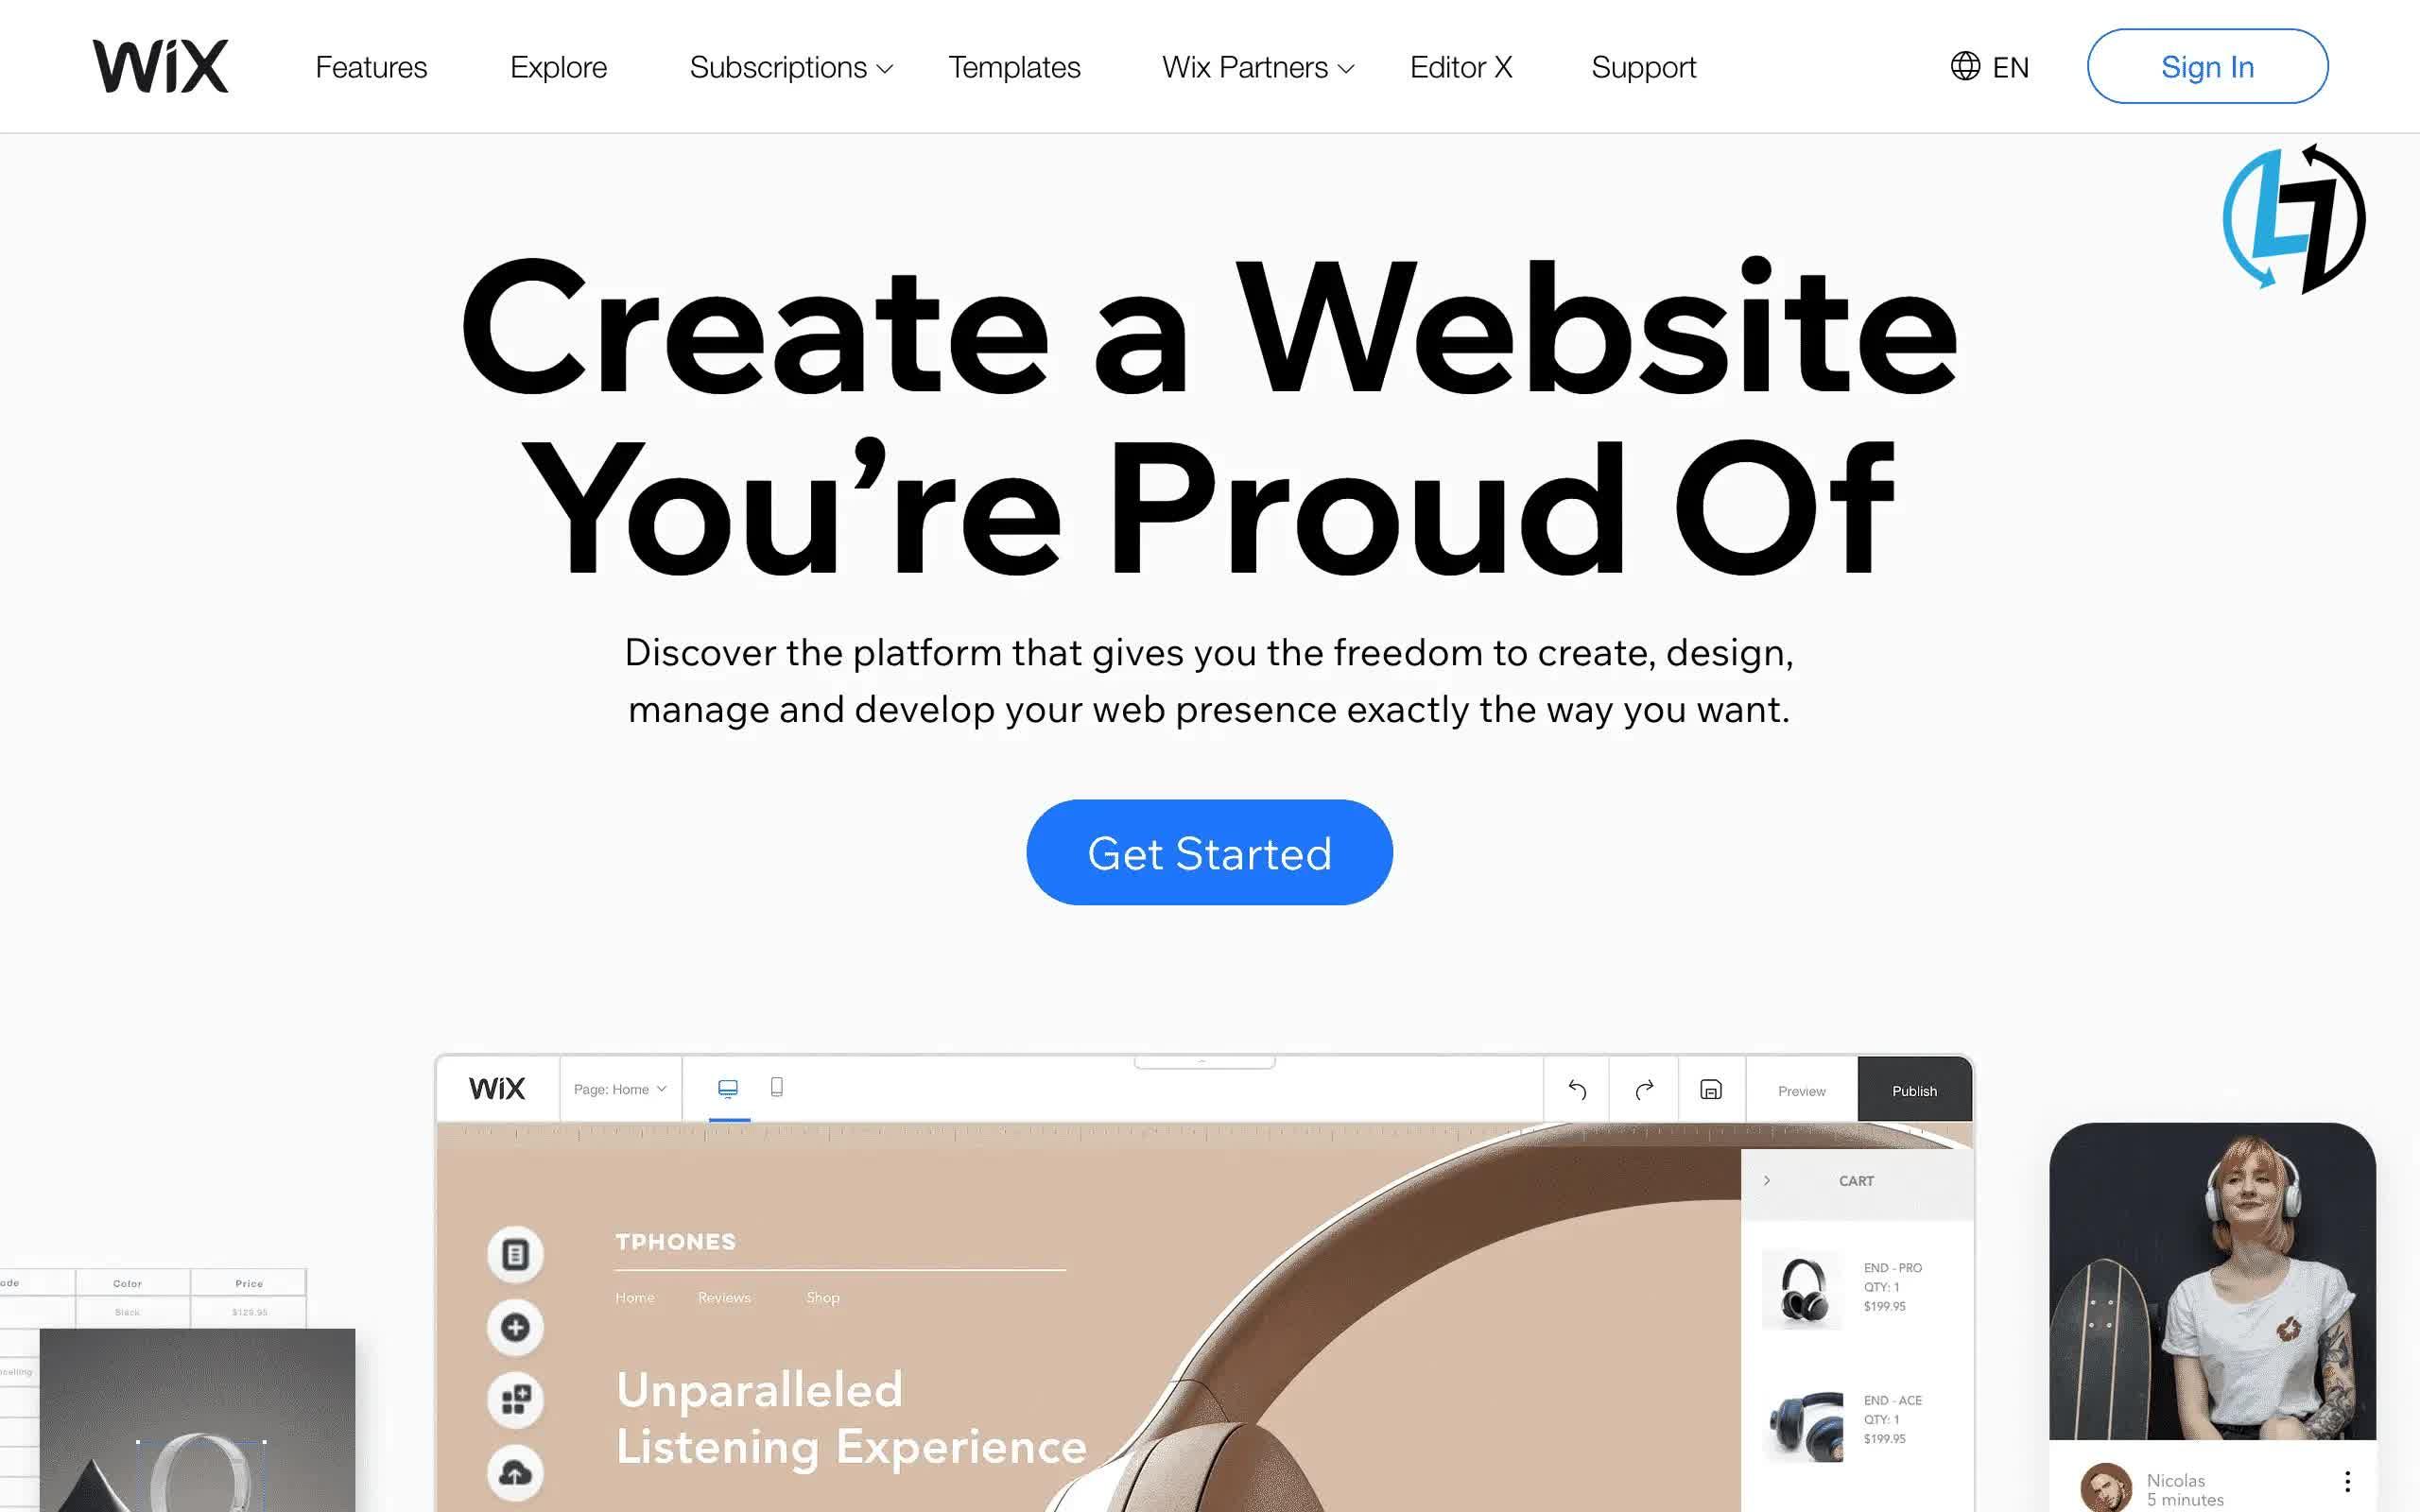 Wix website tools